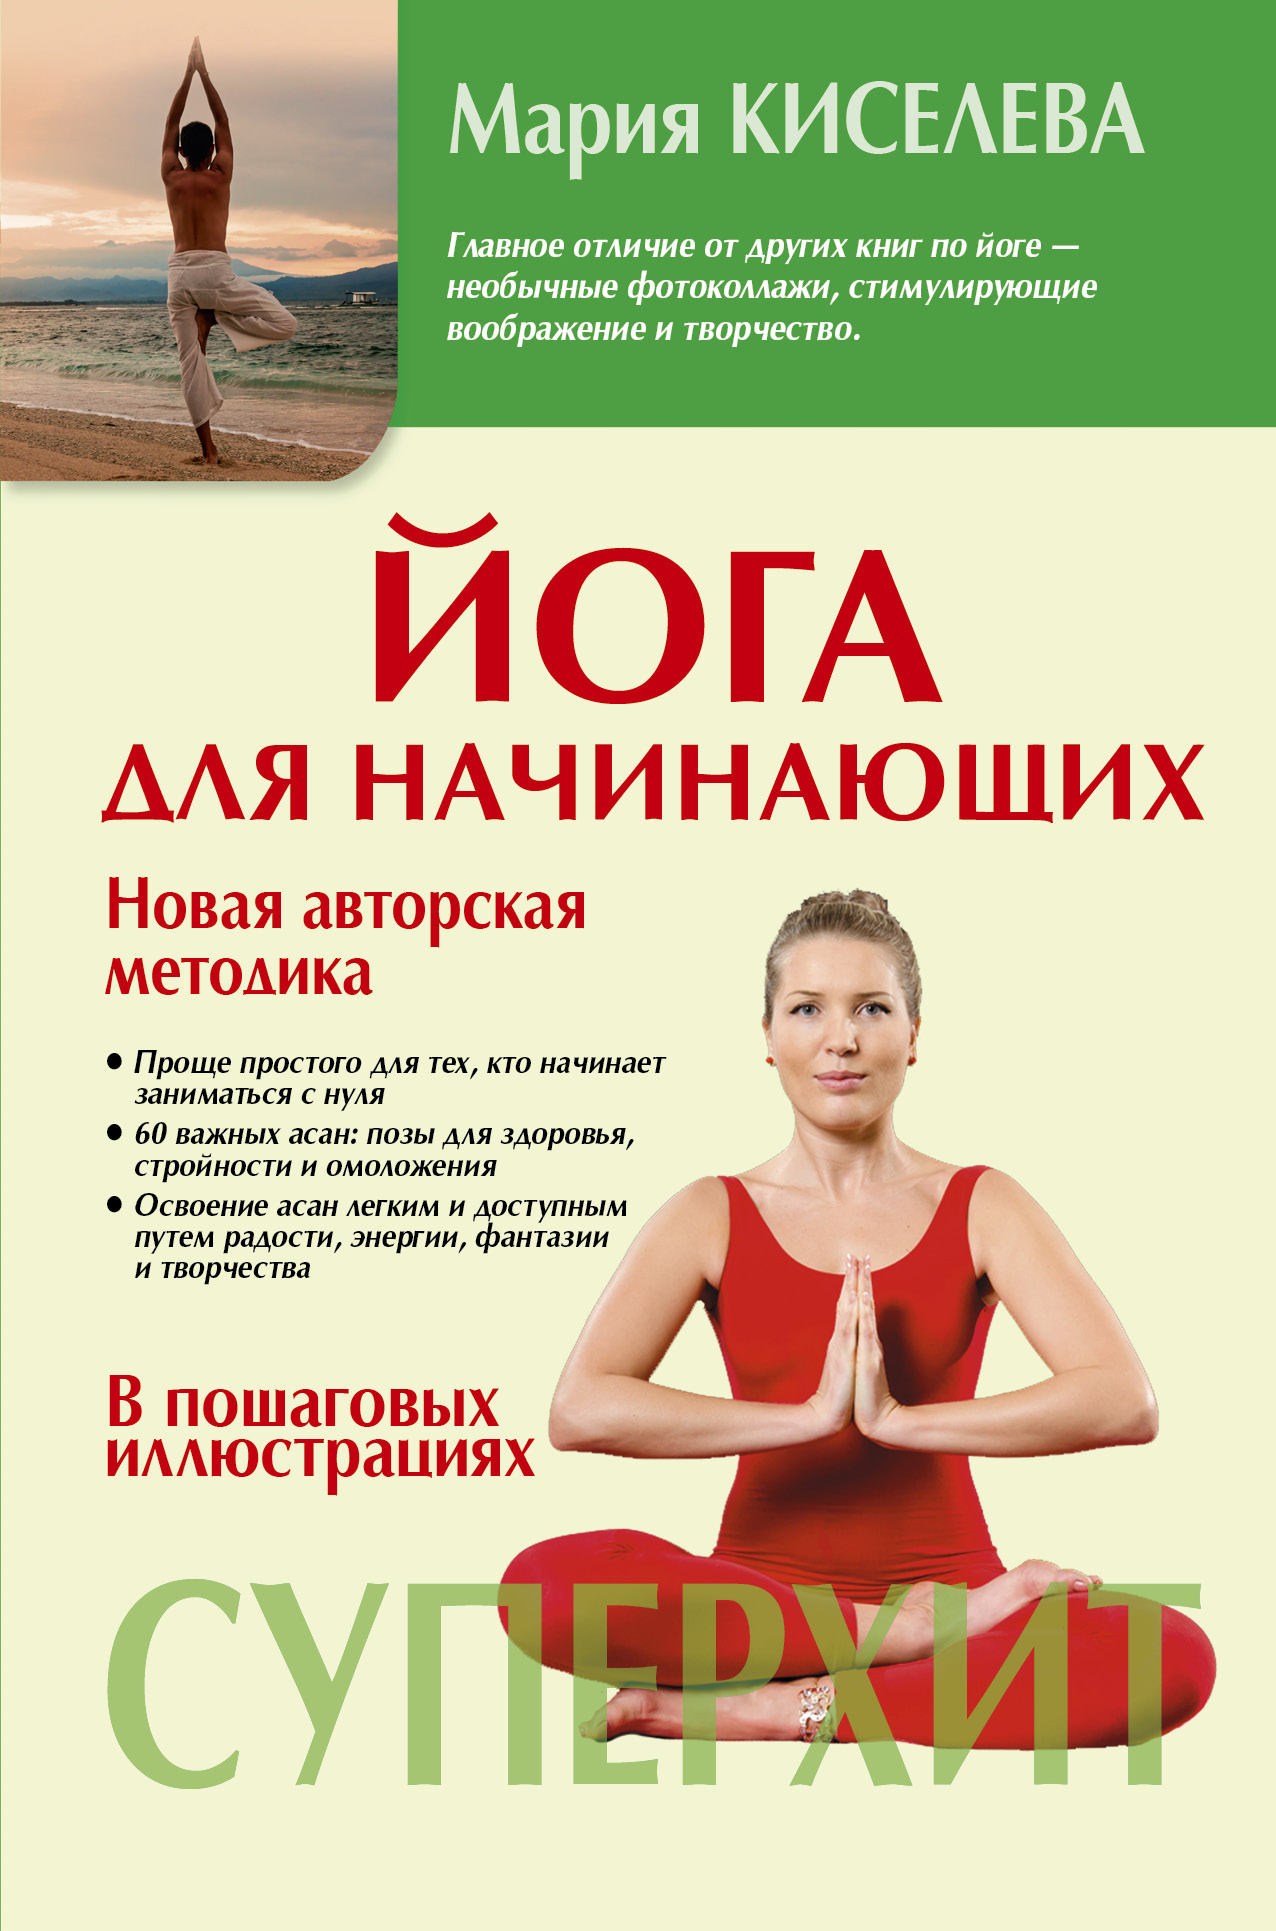 Йога для начинающих ( Киселева М.  )